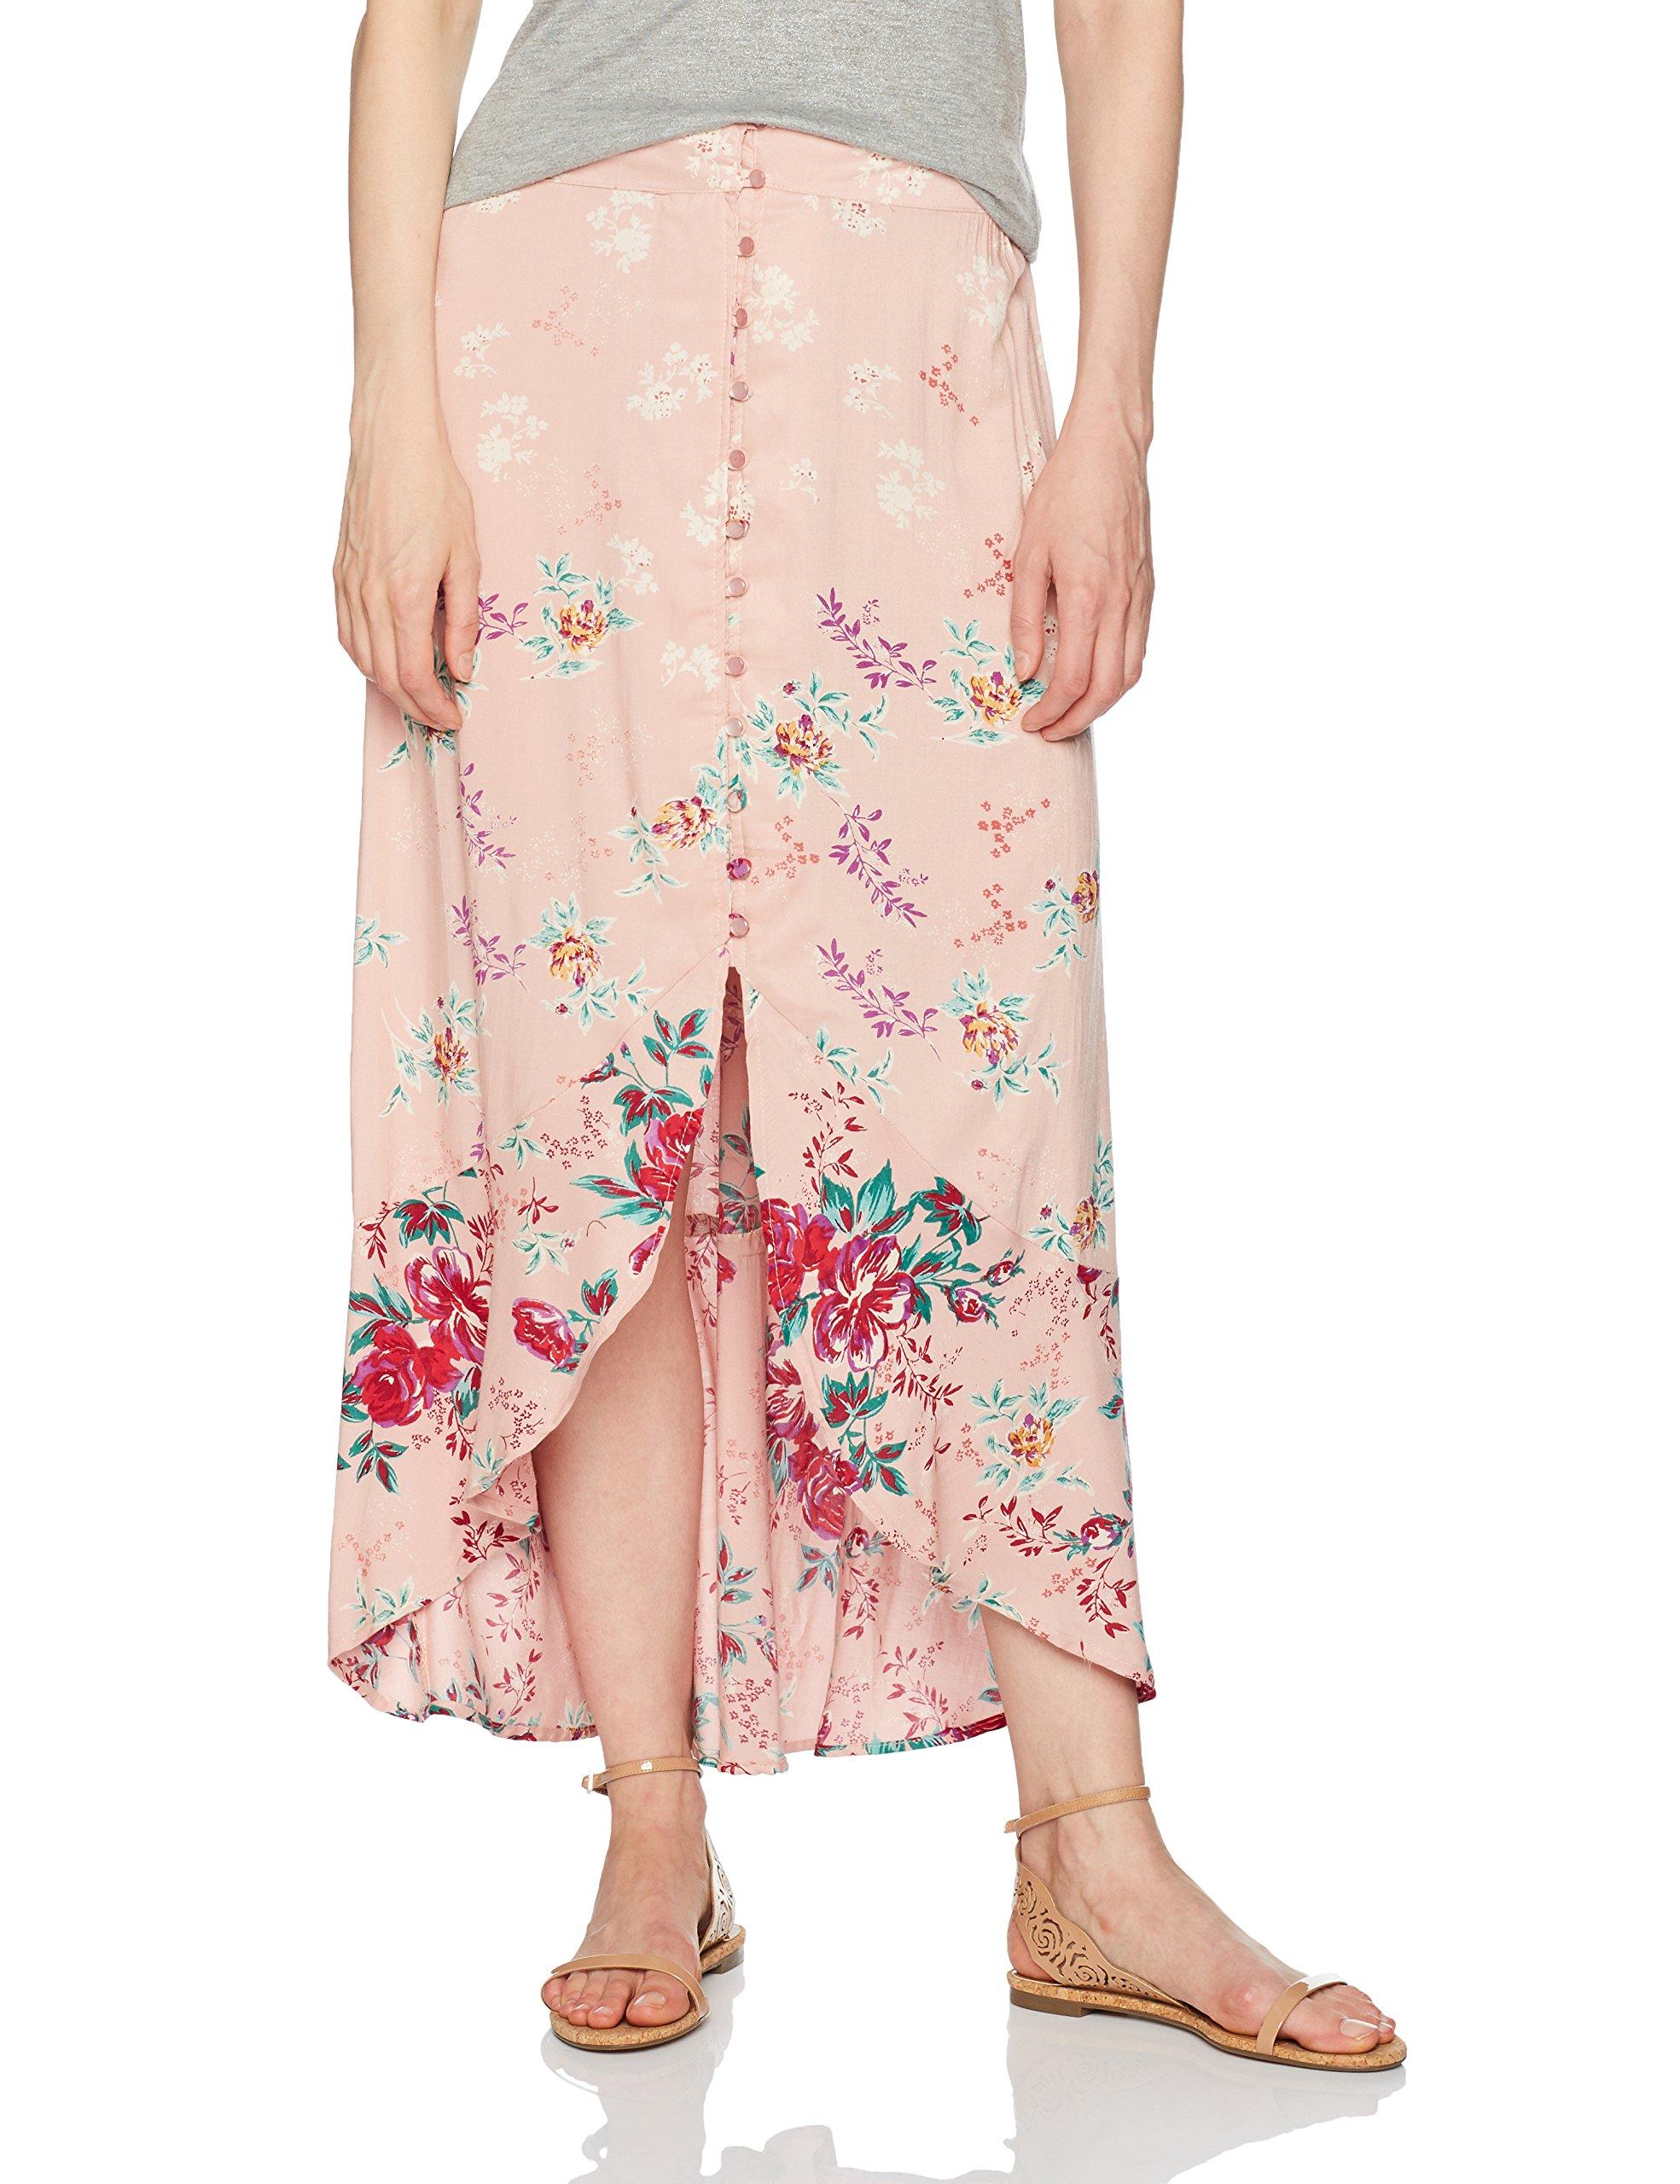 Angie Women's Rose Printed Button Front Ruffle Hem Skirt, Rose Tone, Large